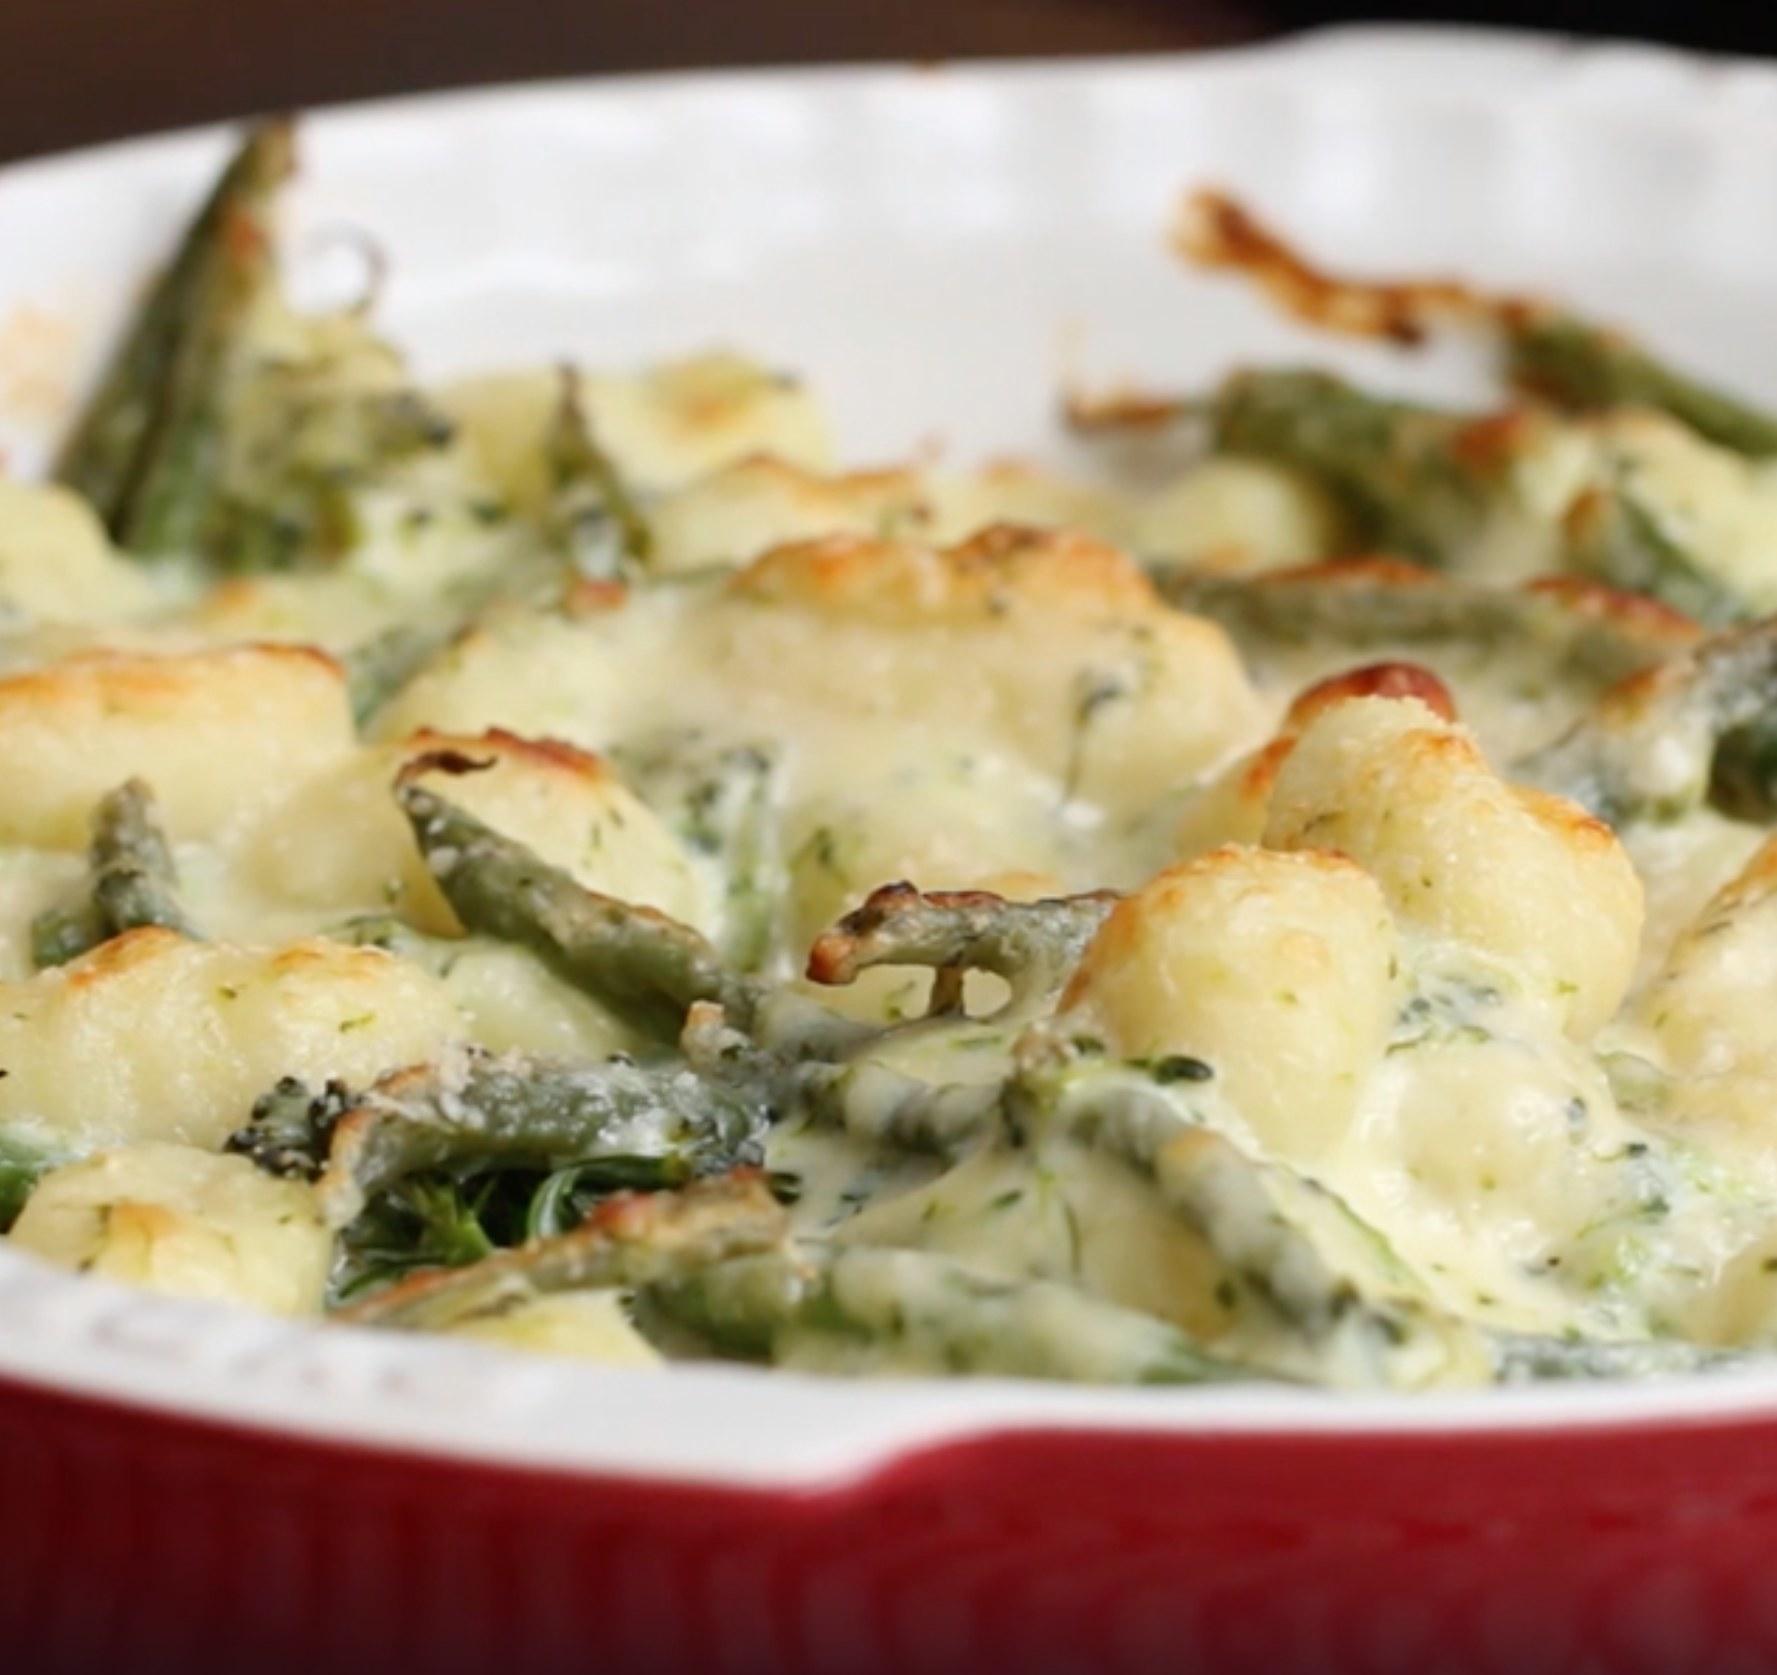 A pan of cheesy broccoli gnocchi